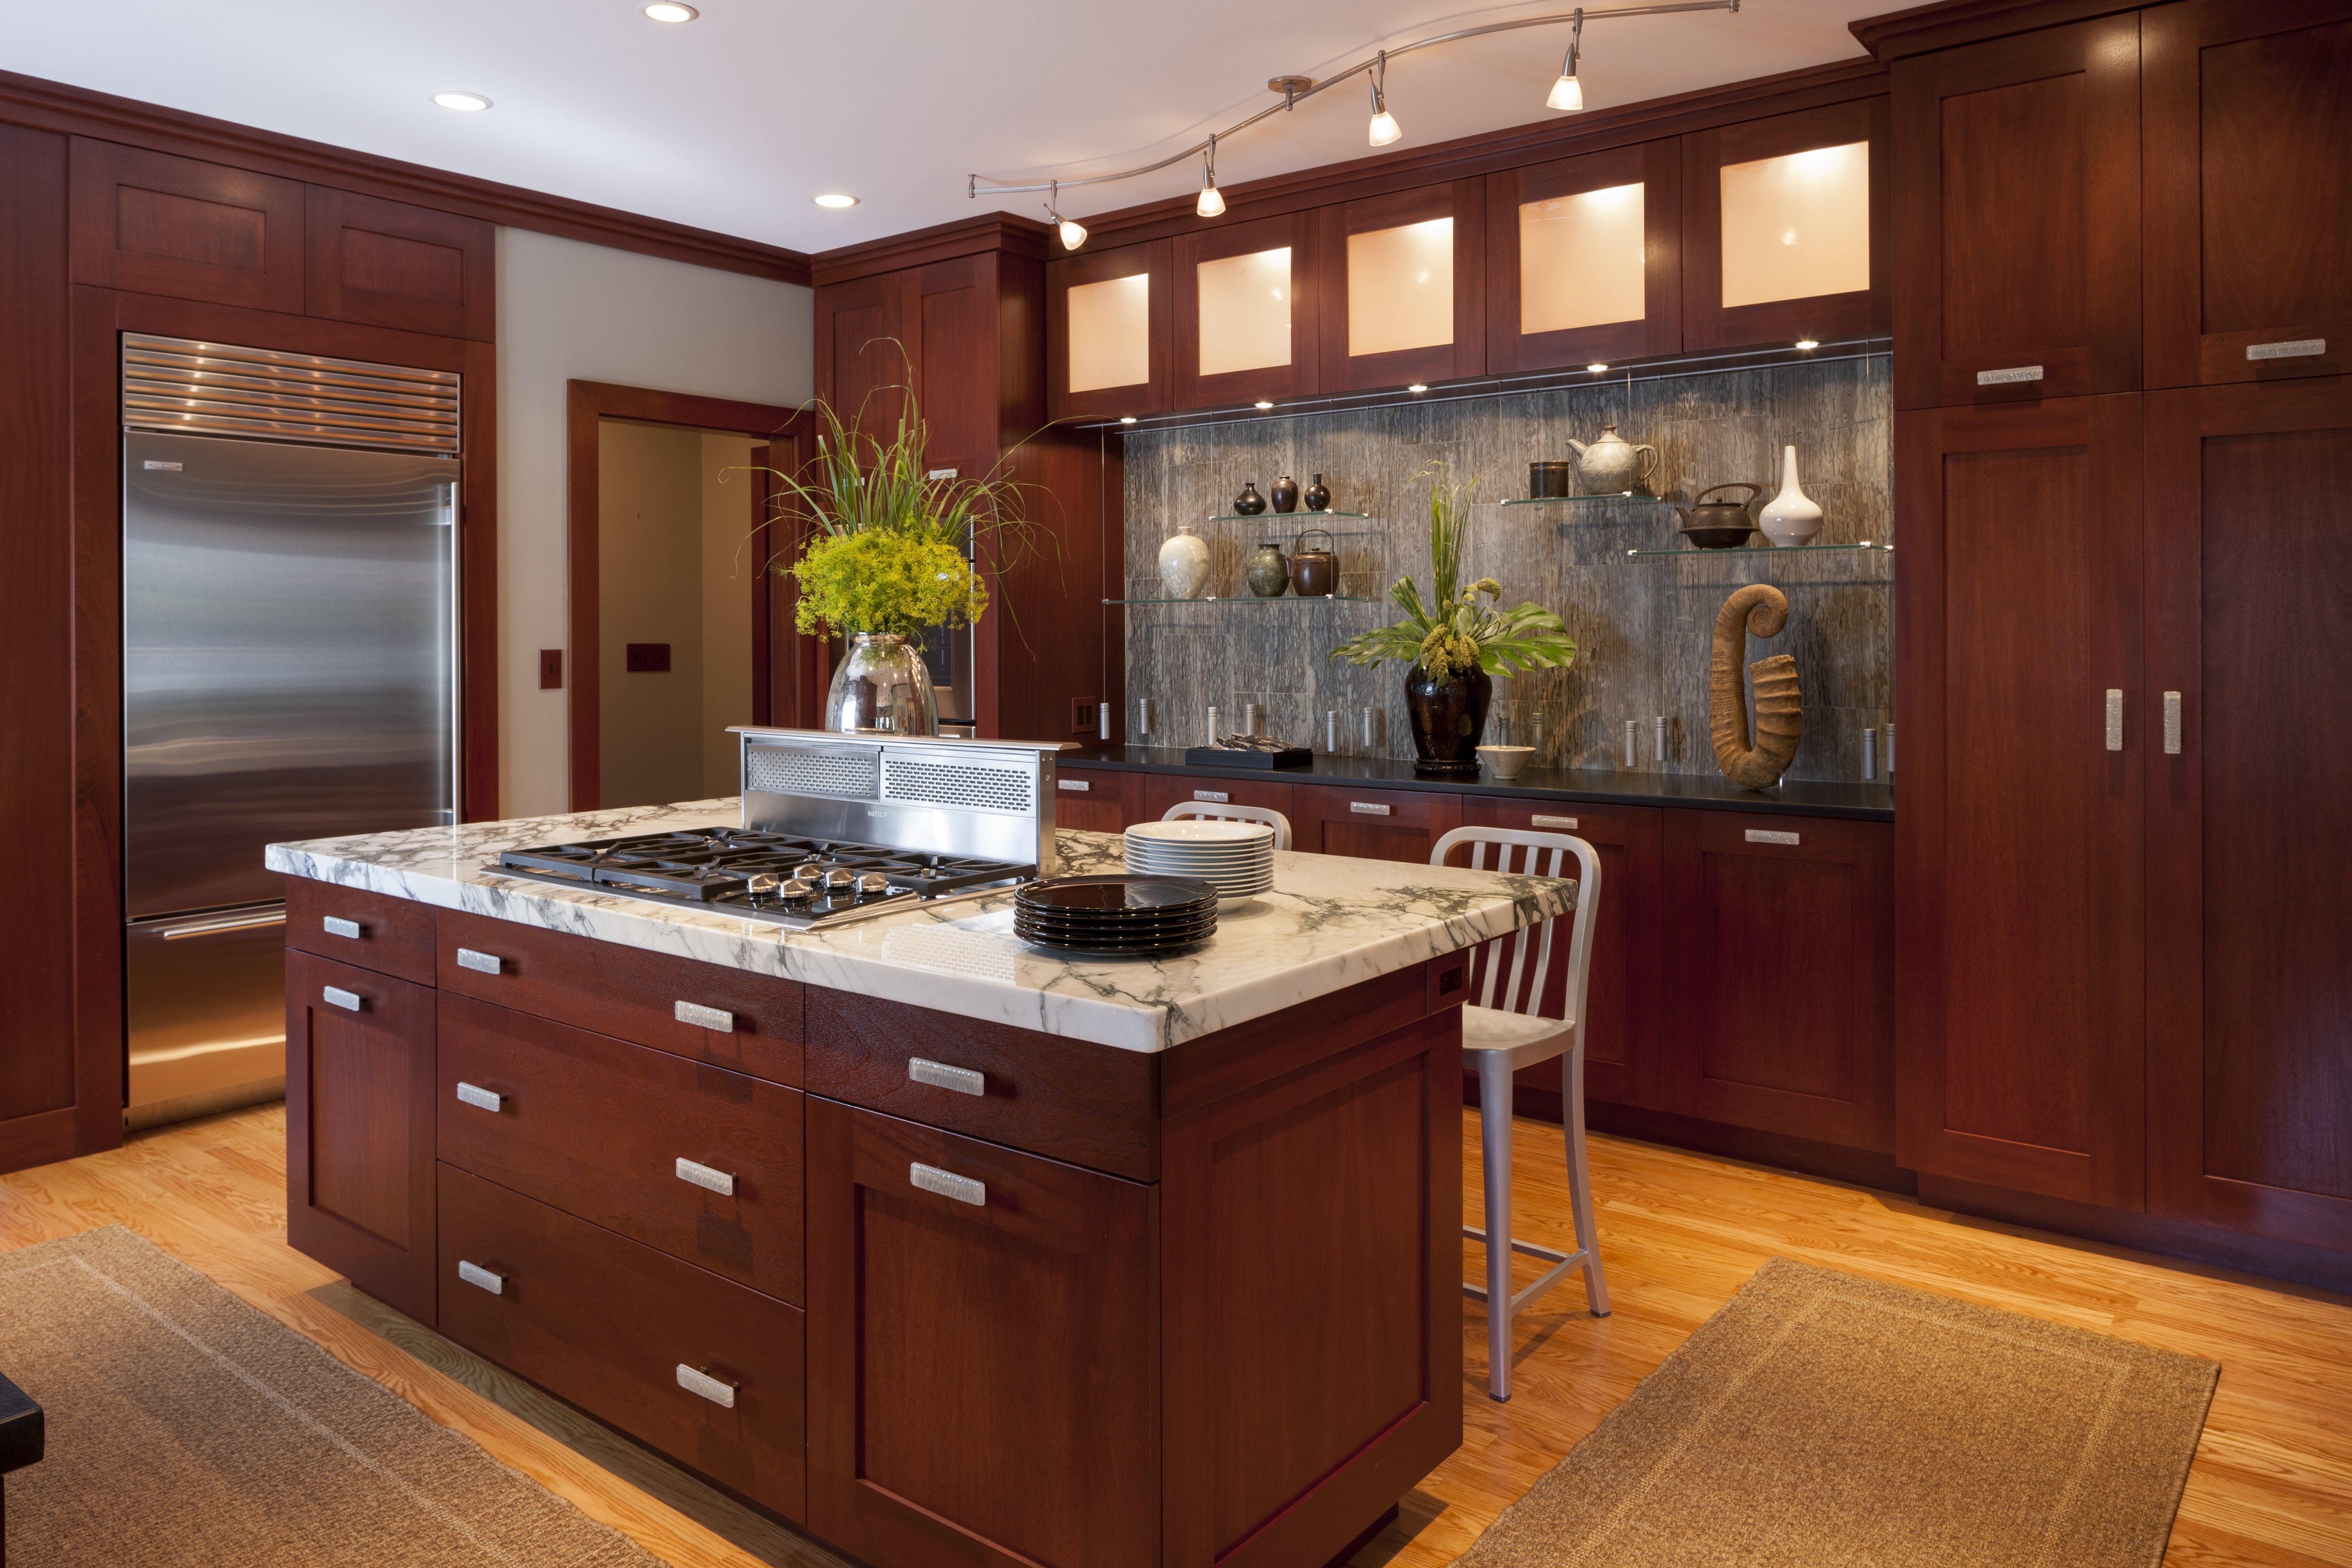 Effective Kitchen Lighting Elizabeth Swartz Interiors